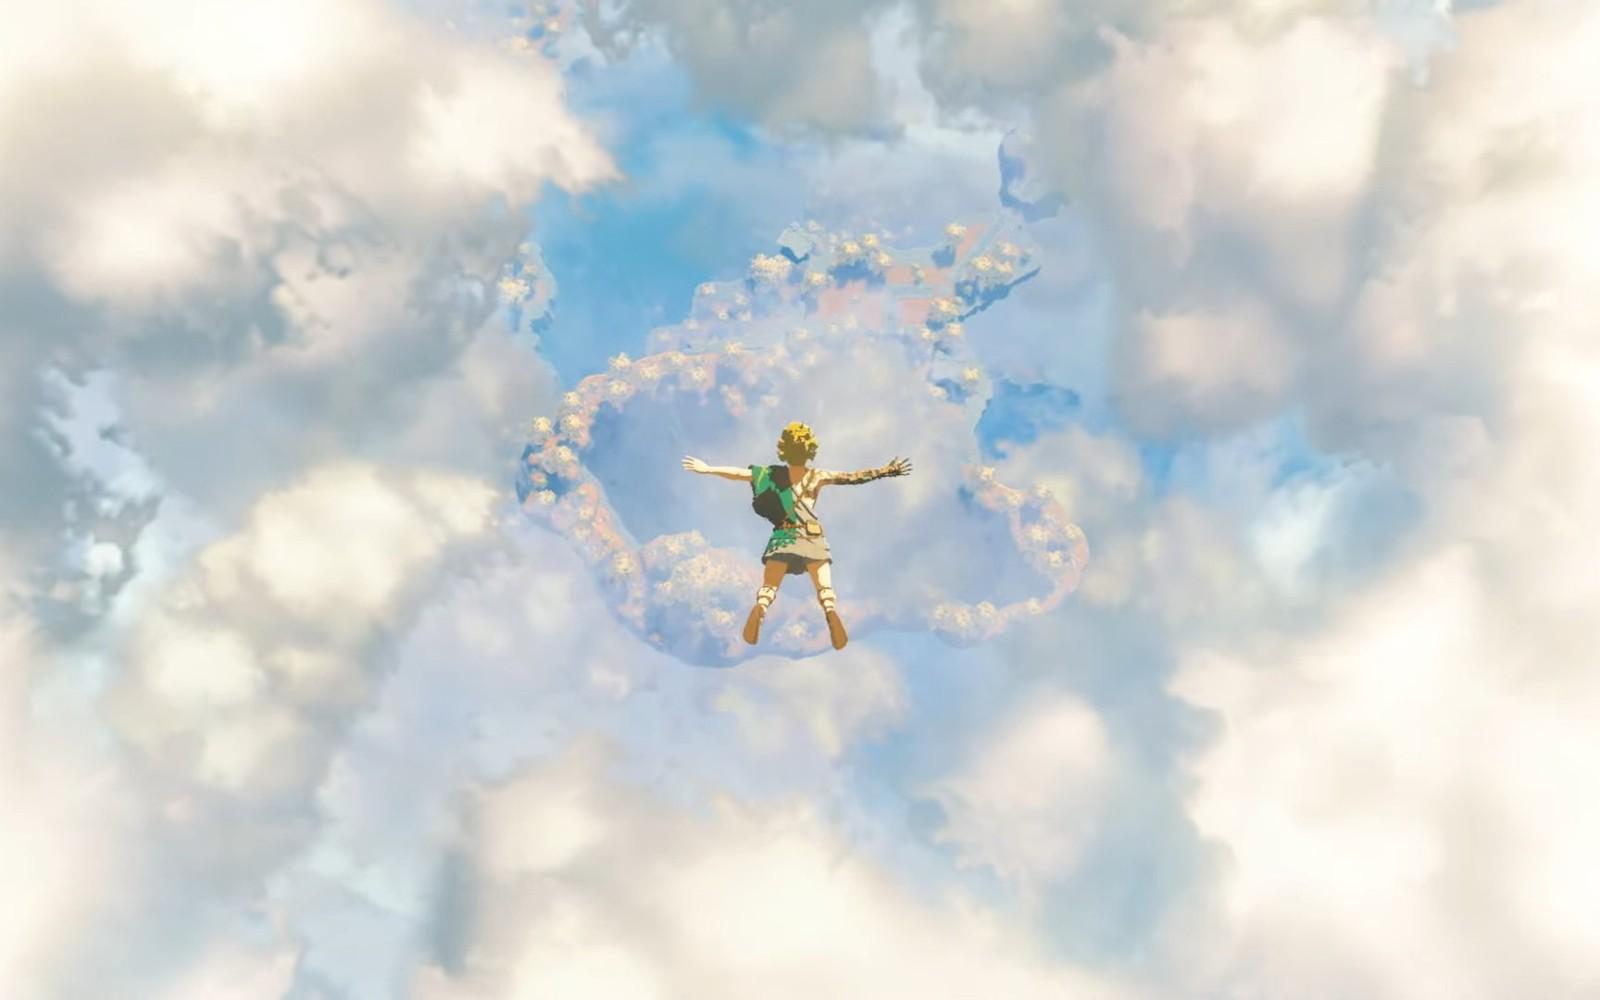 薩爾達傳說:曠野之息 The Legend of Zelda: Breath of the Wild